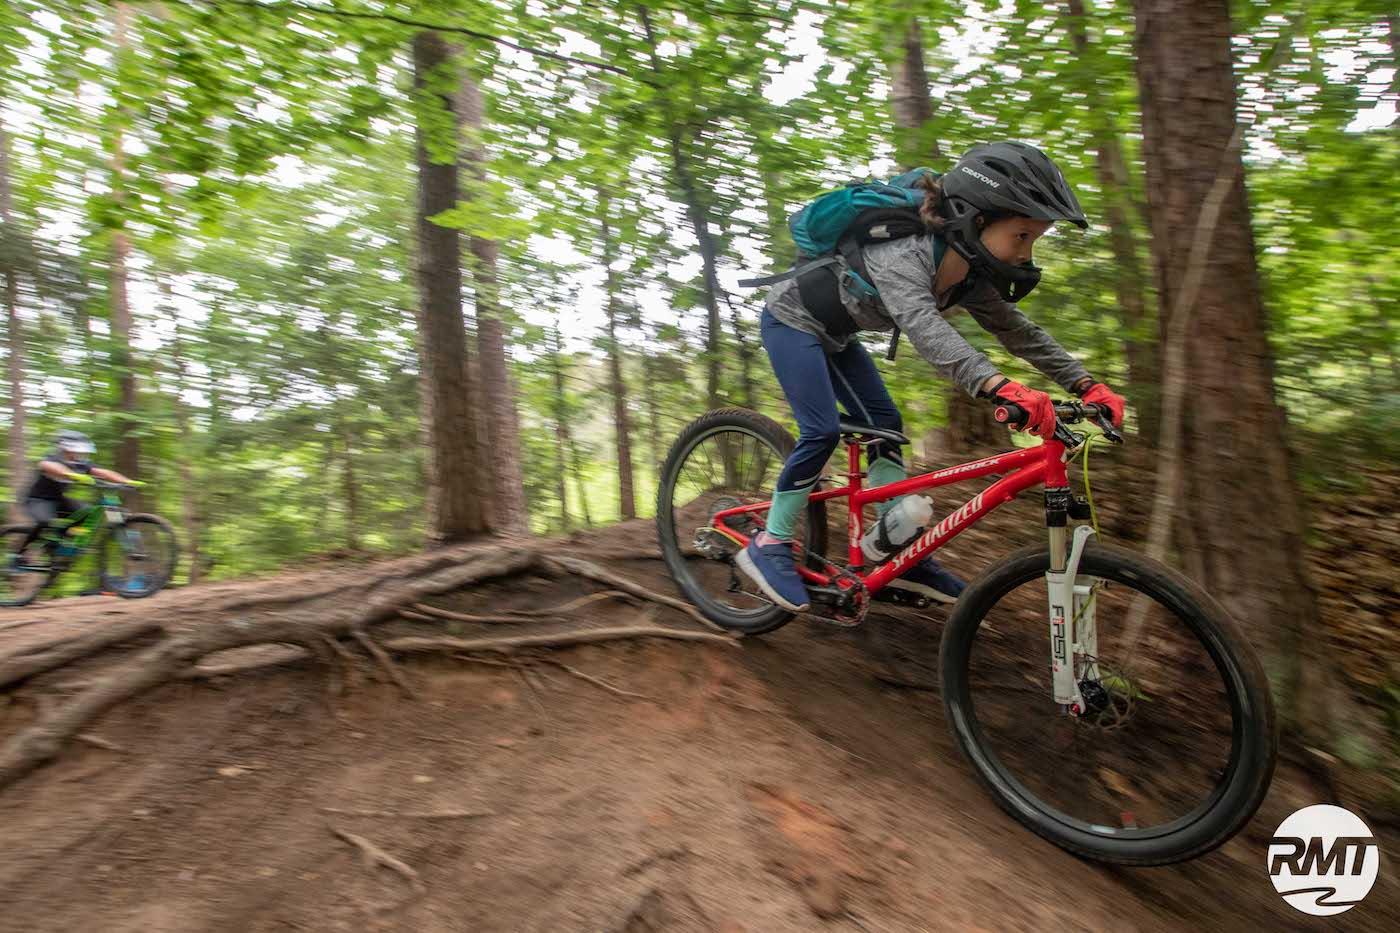 Mountainbike Kinder Kurs in Bad Orb |Spessart - 8-12 Jahre Kids - Rock my Trail Fahrtechnik Bikeschule - 14